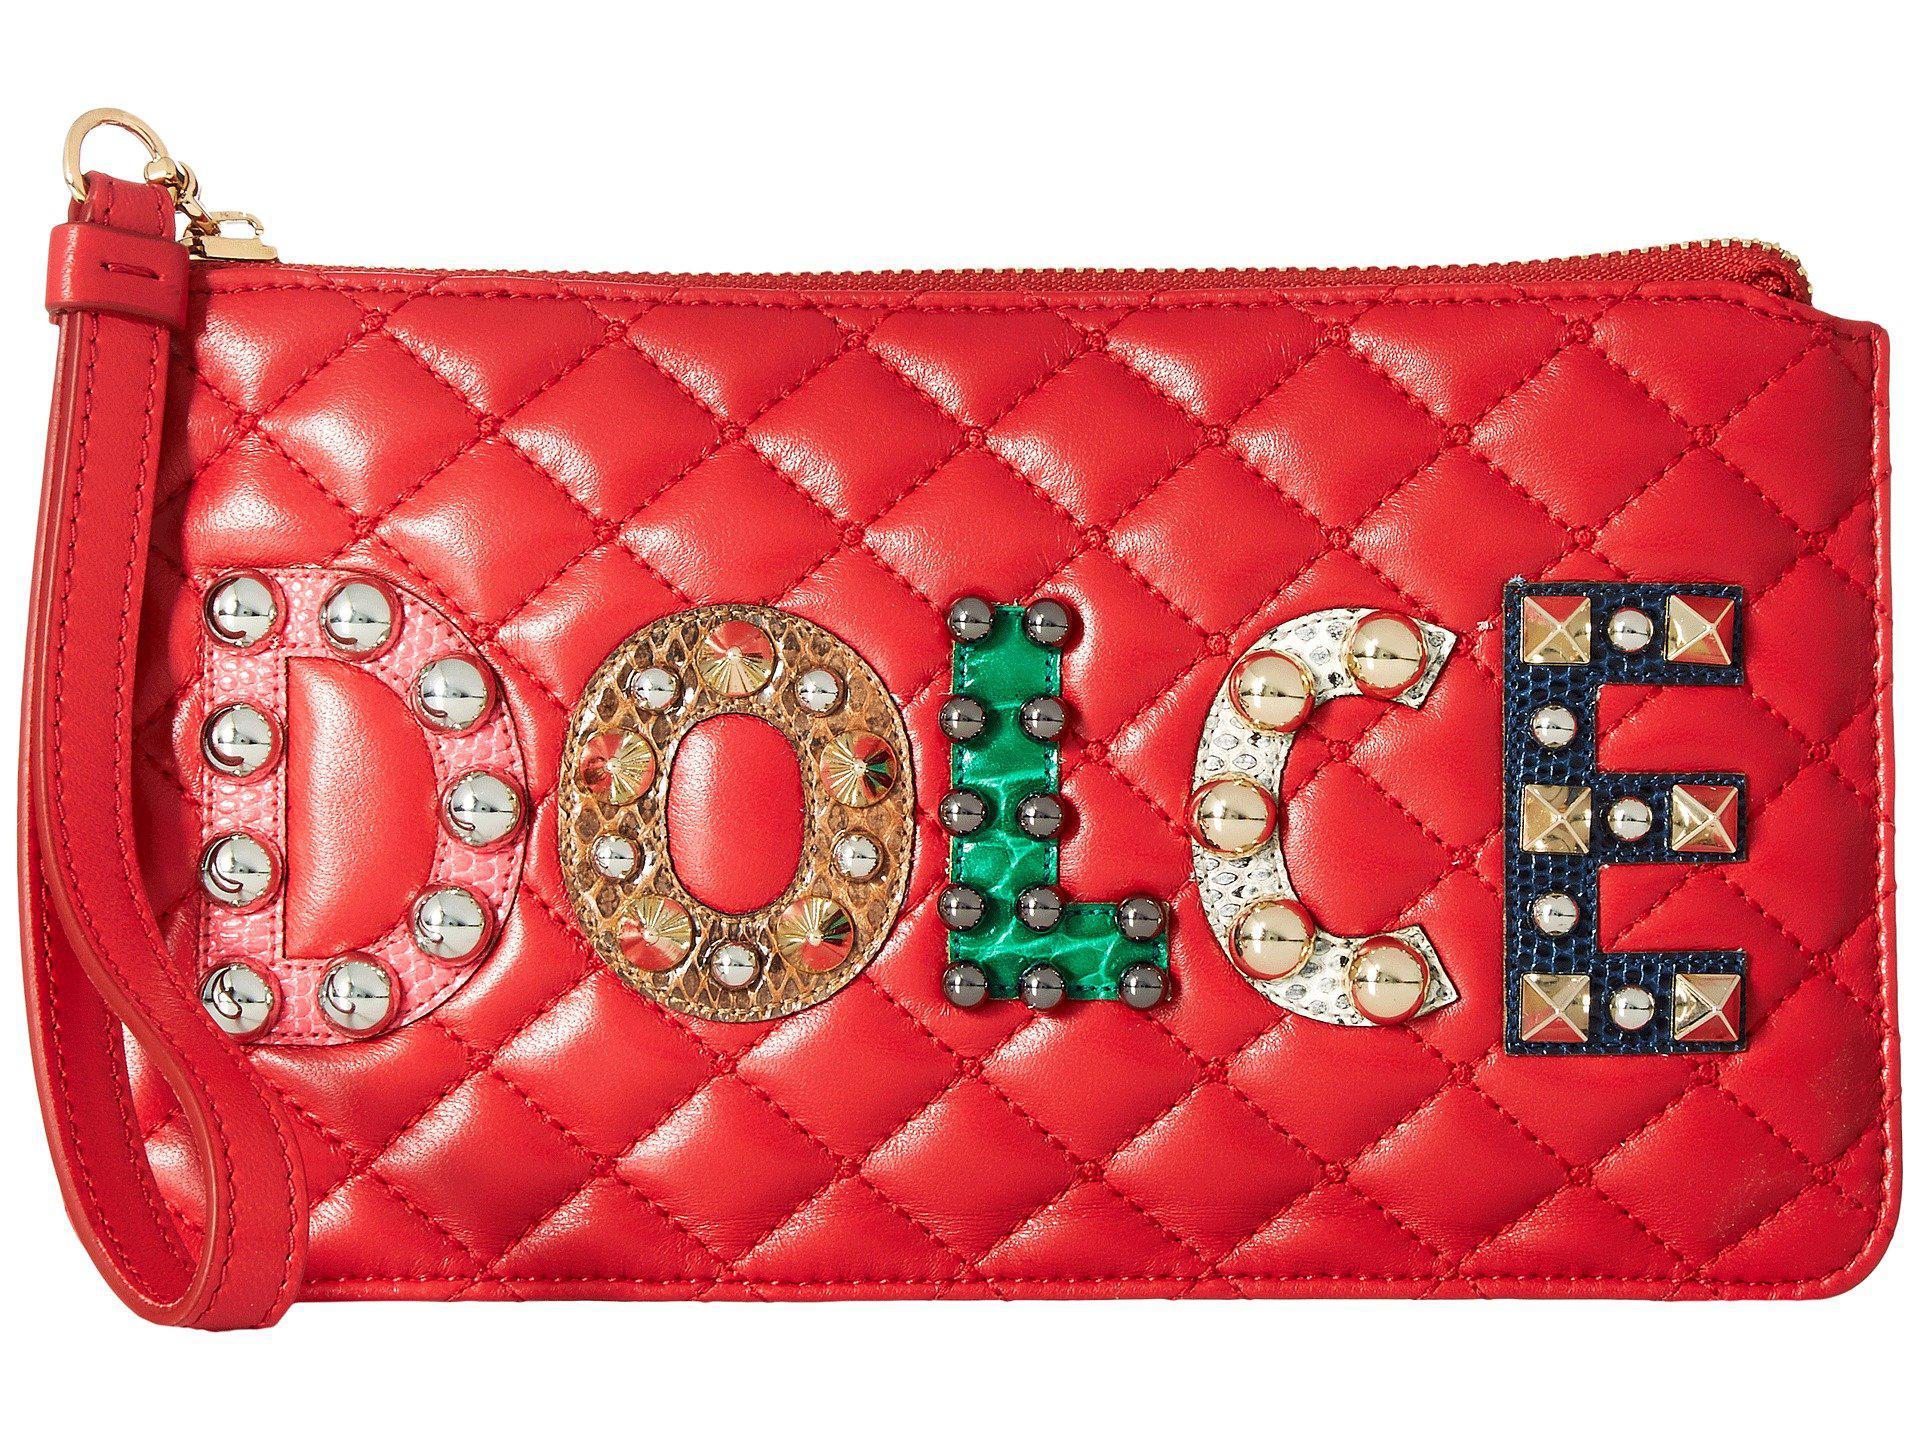 logo studded quilted purse Dolce & Gabbana TnDli